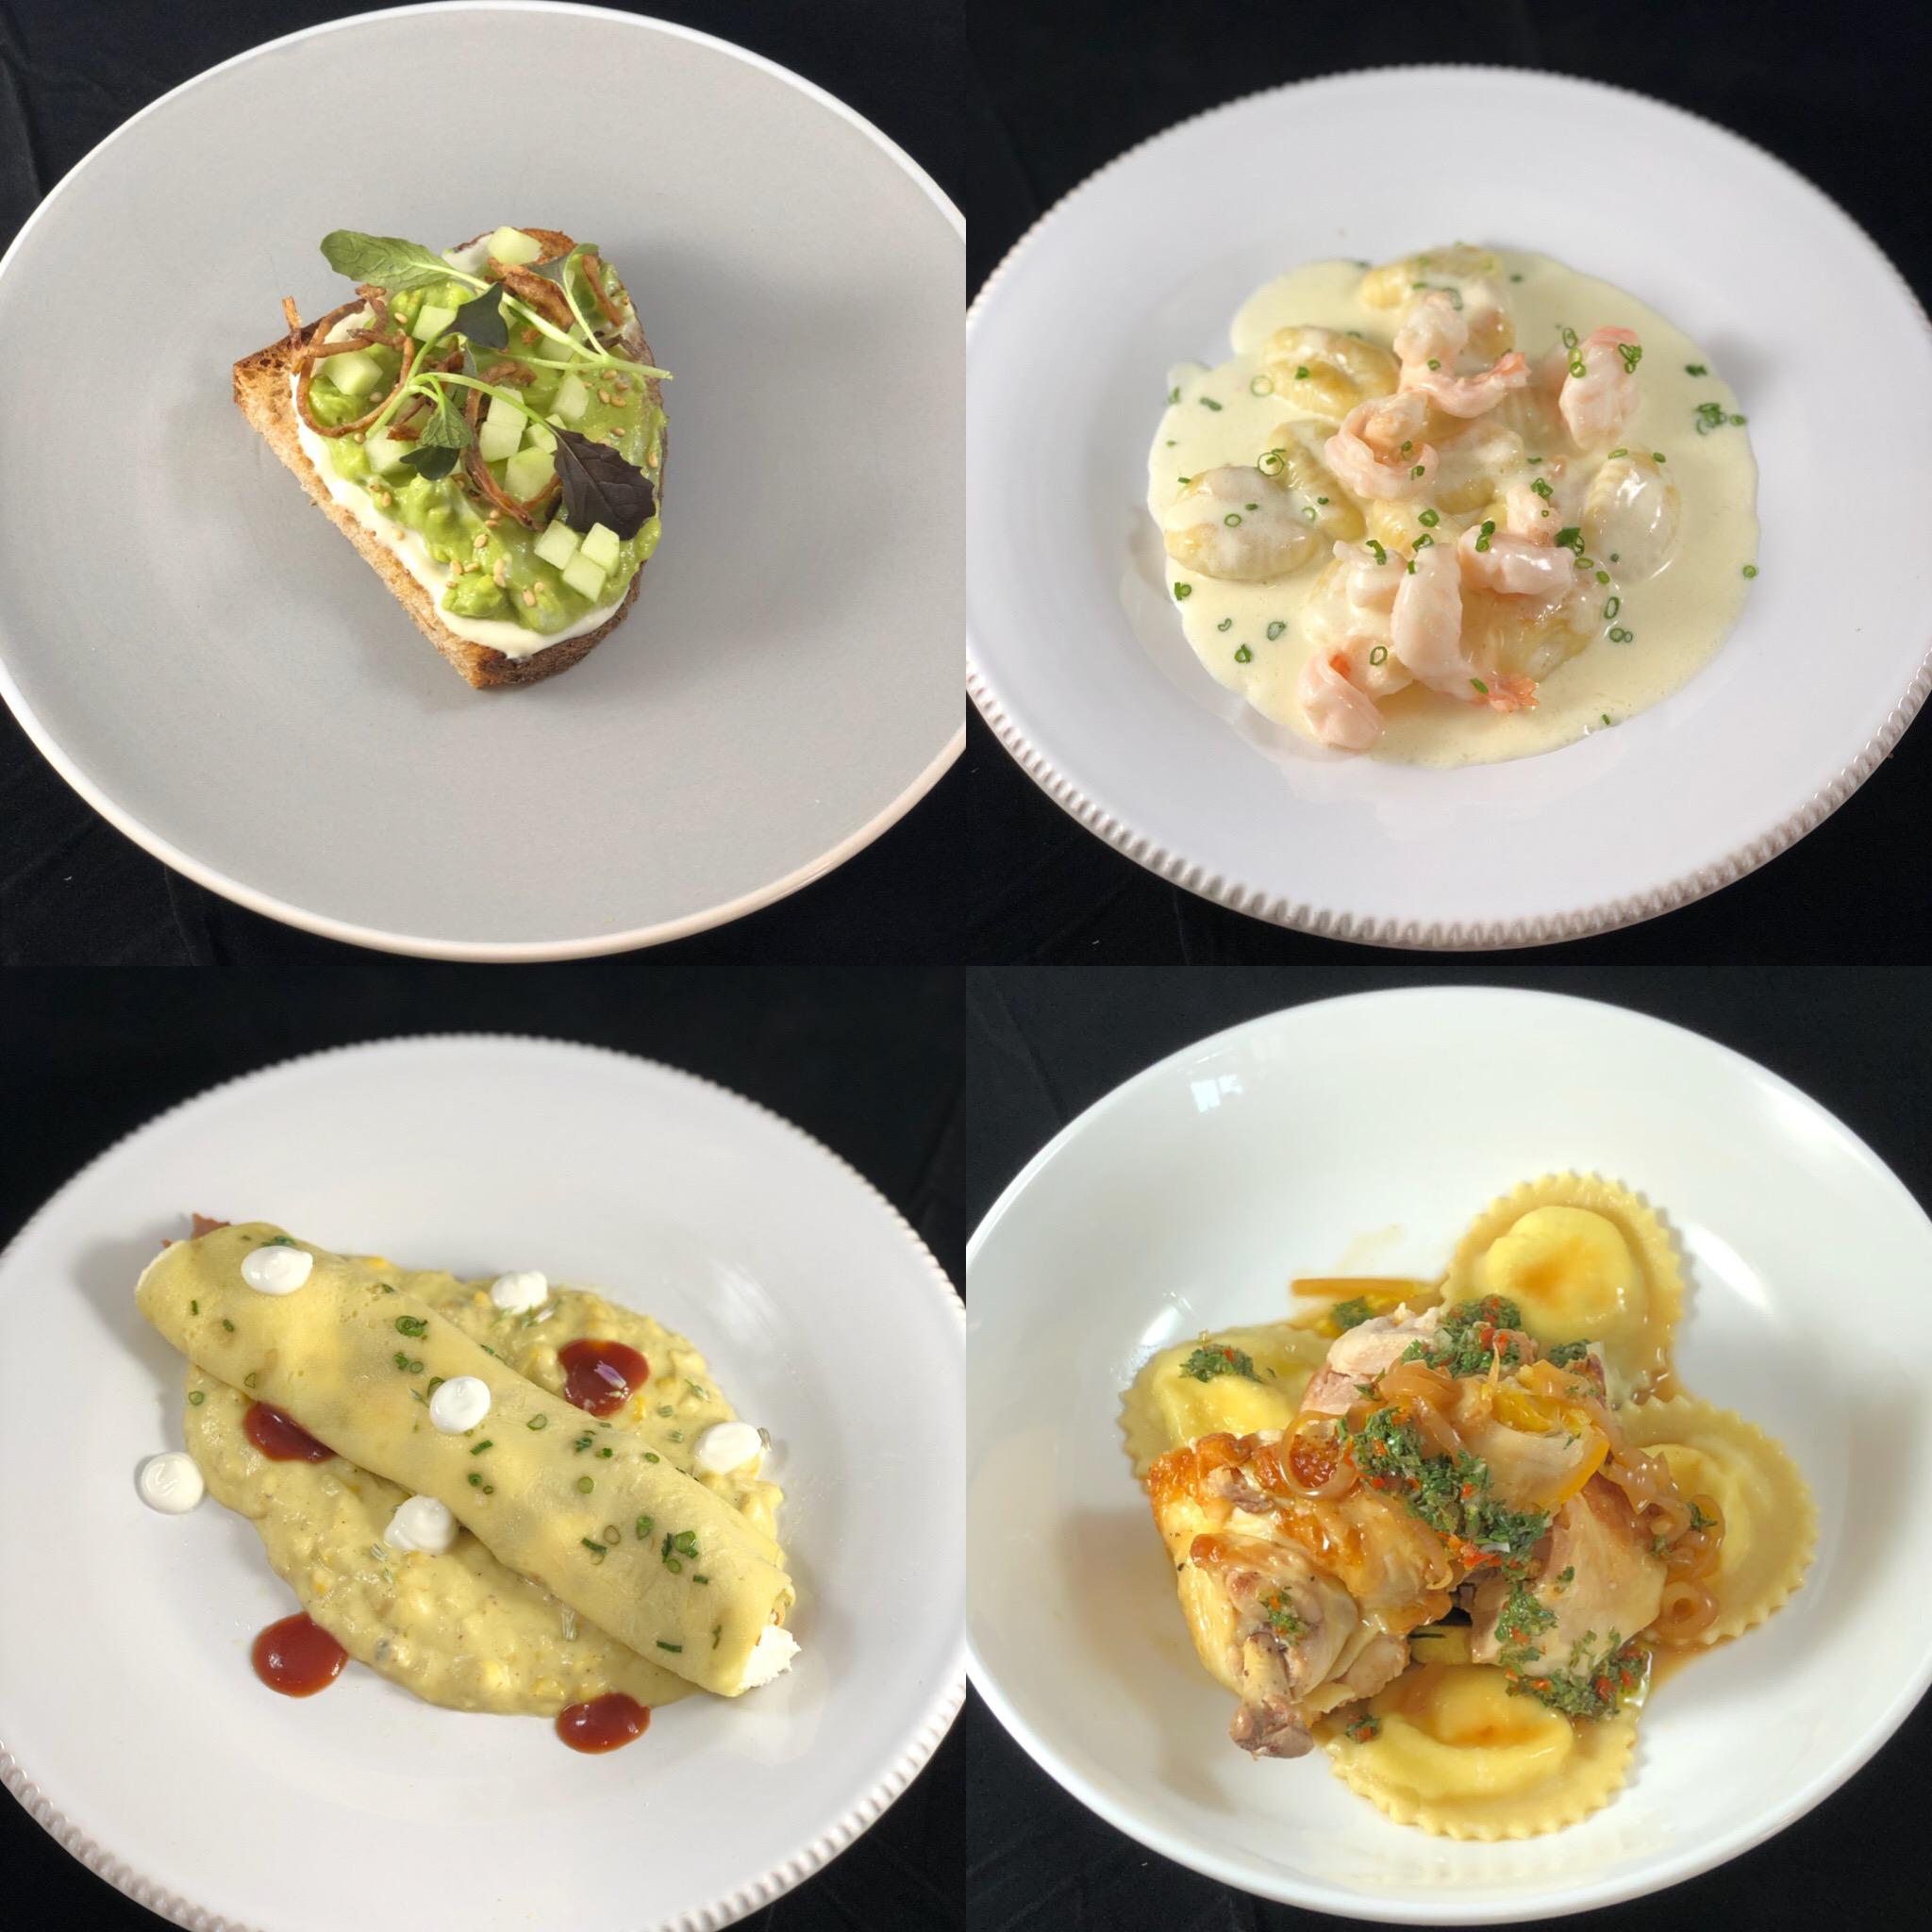 Avocado Toast, Butter Poached Shrimp & Potato Gnocchi, BBQ Duck Crepe & Creamed Corn, Ricotta Ravioli & Roasted Chicken